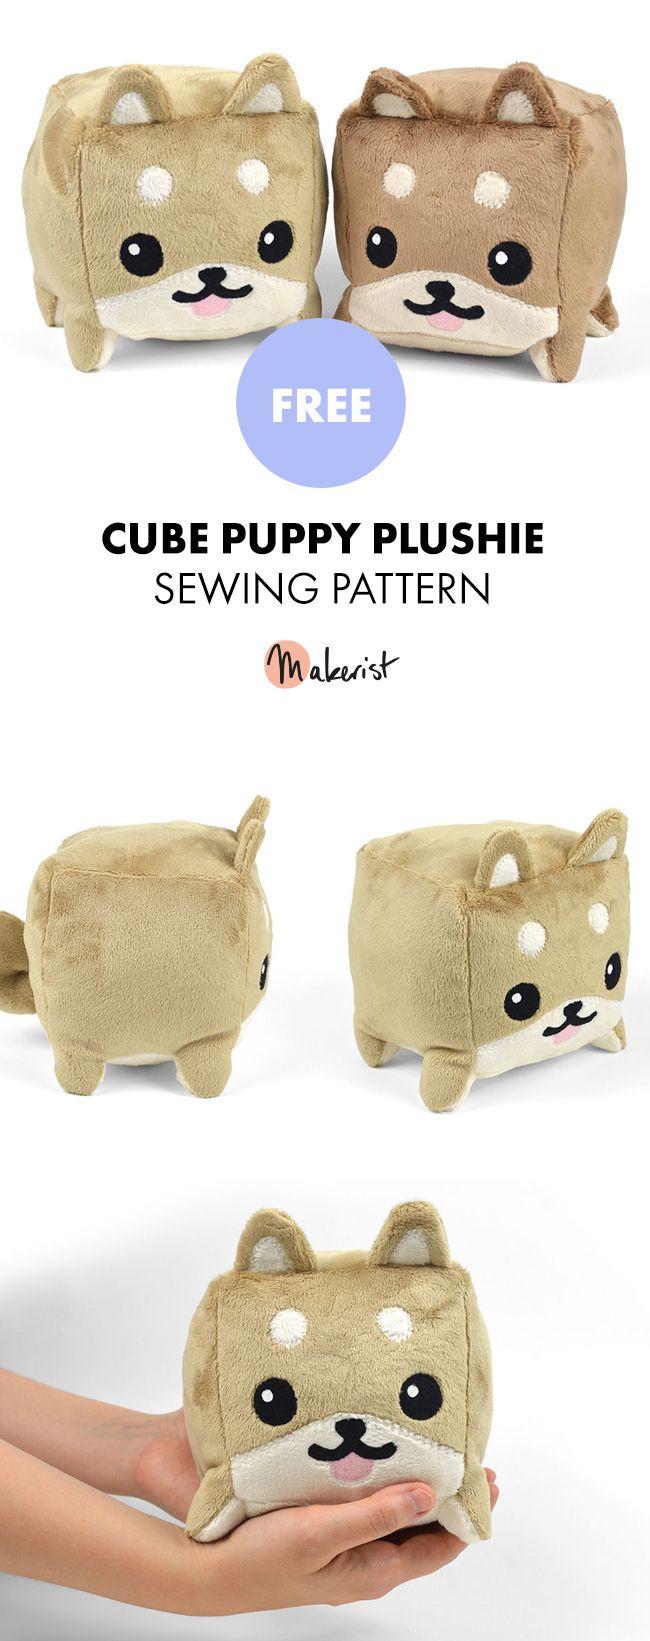 Cube Puppy Plushie Toy - Free Sewing Patterns via Makerist.com